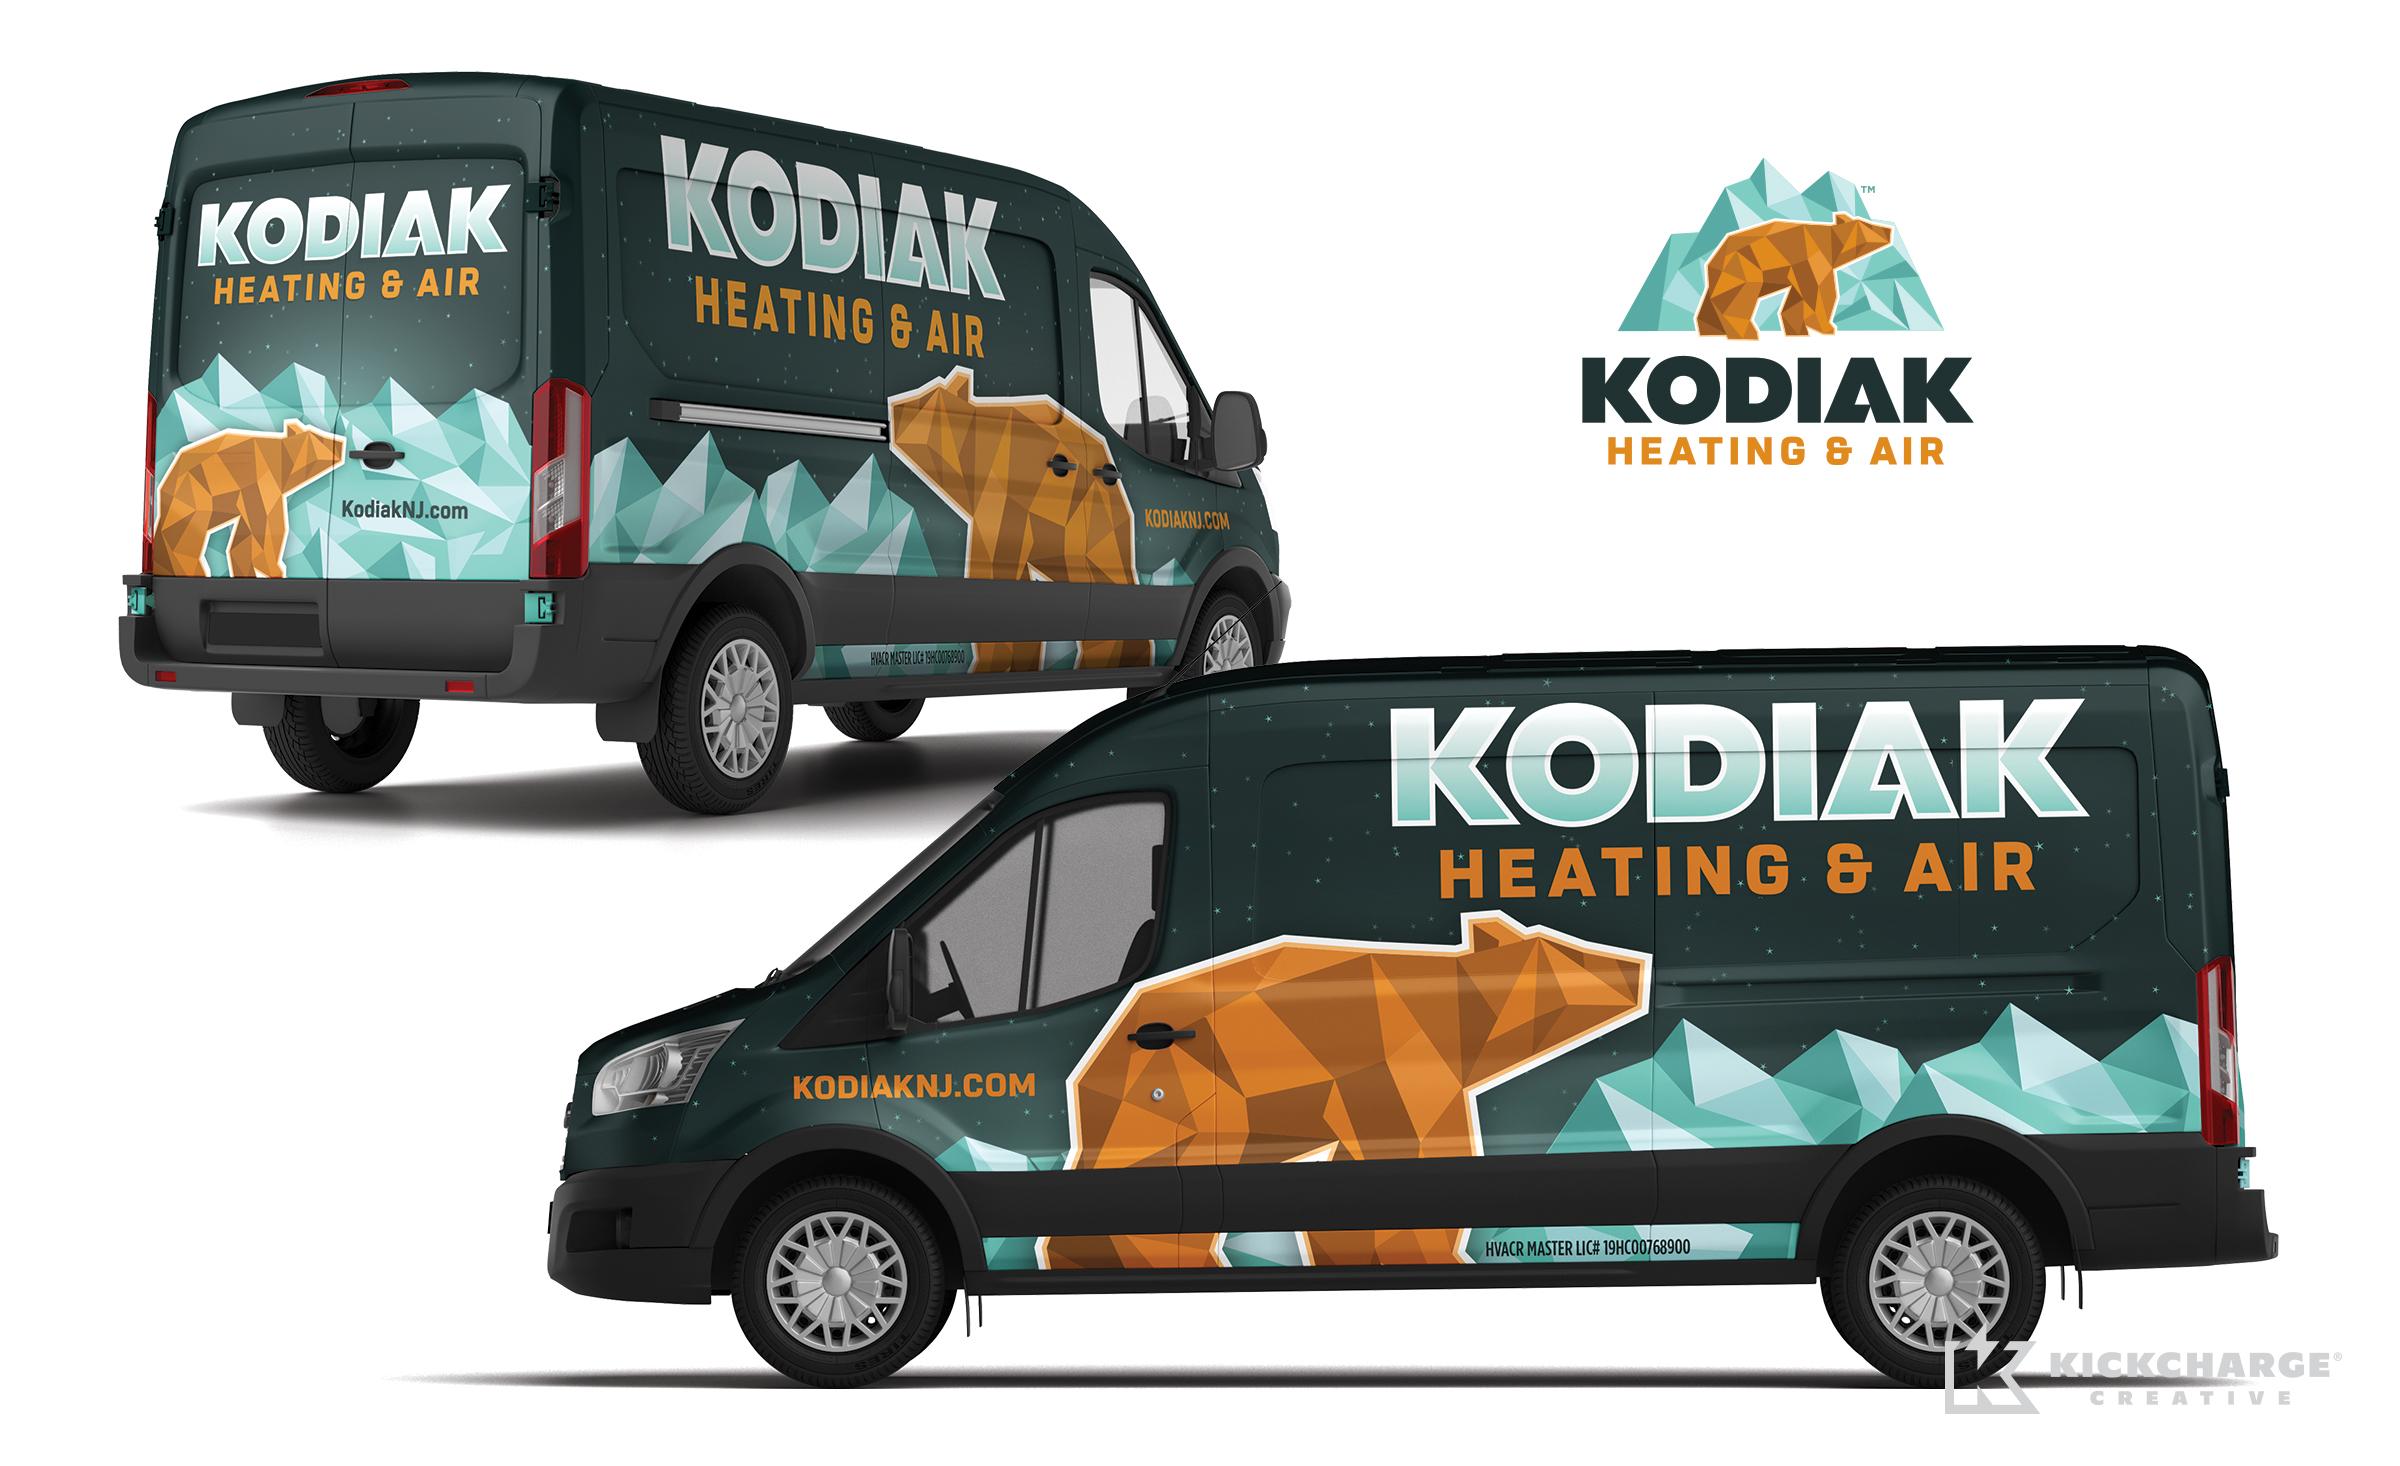 hvac truck wrap for Kodiak Heating & Air